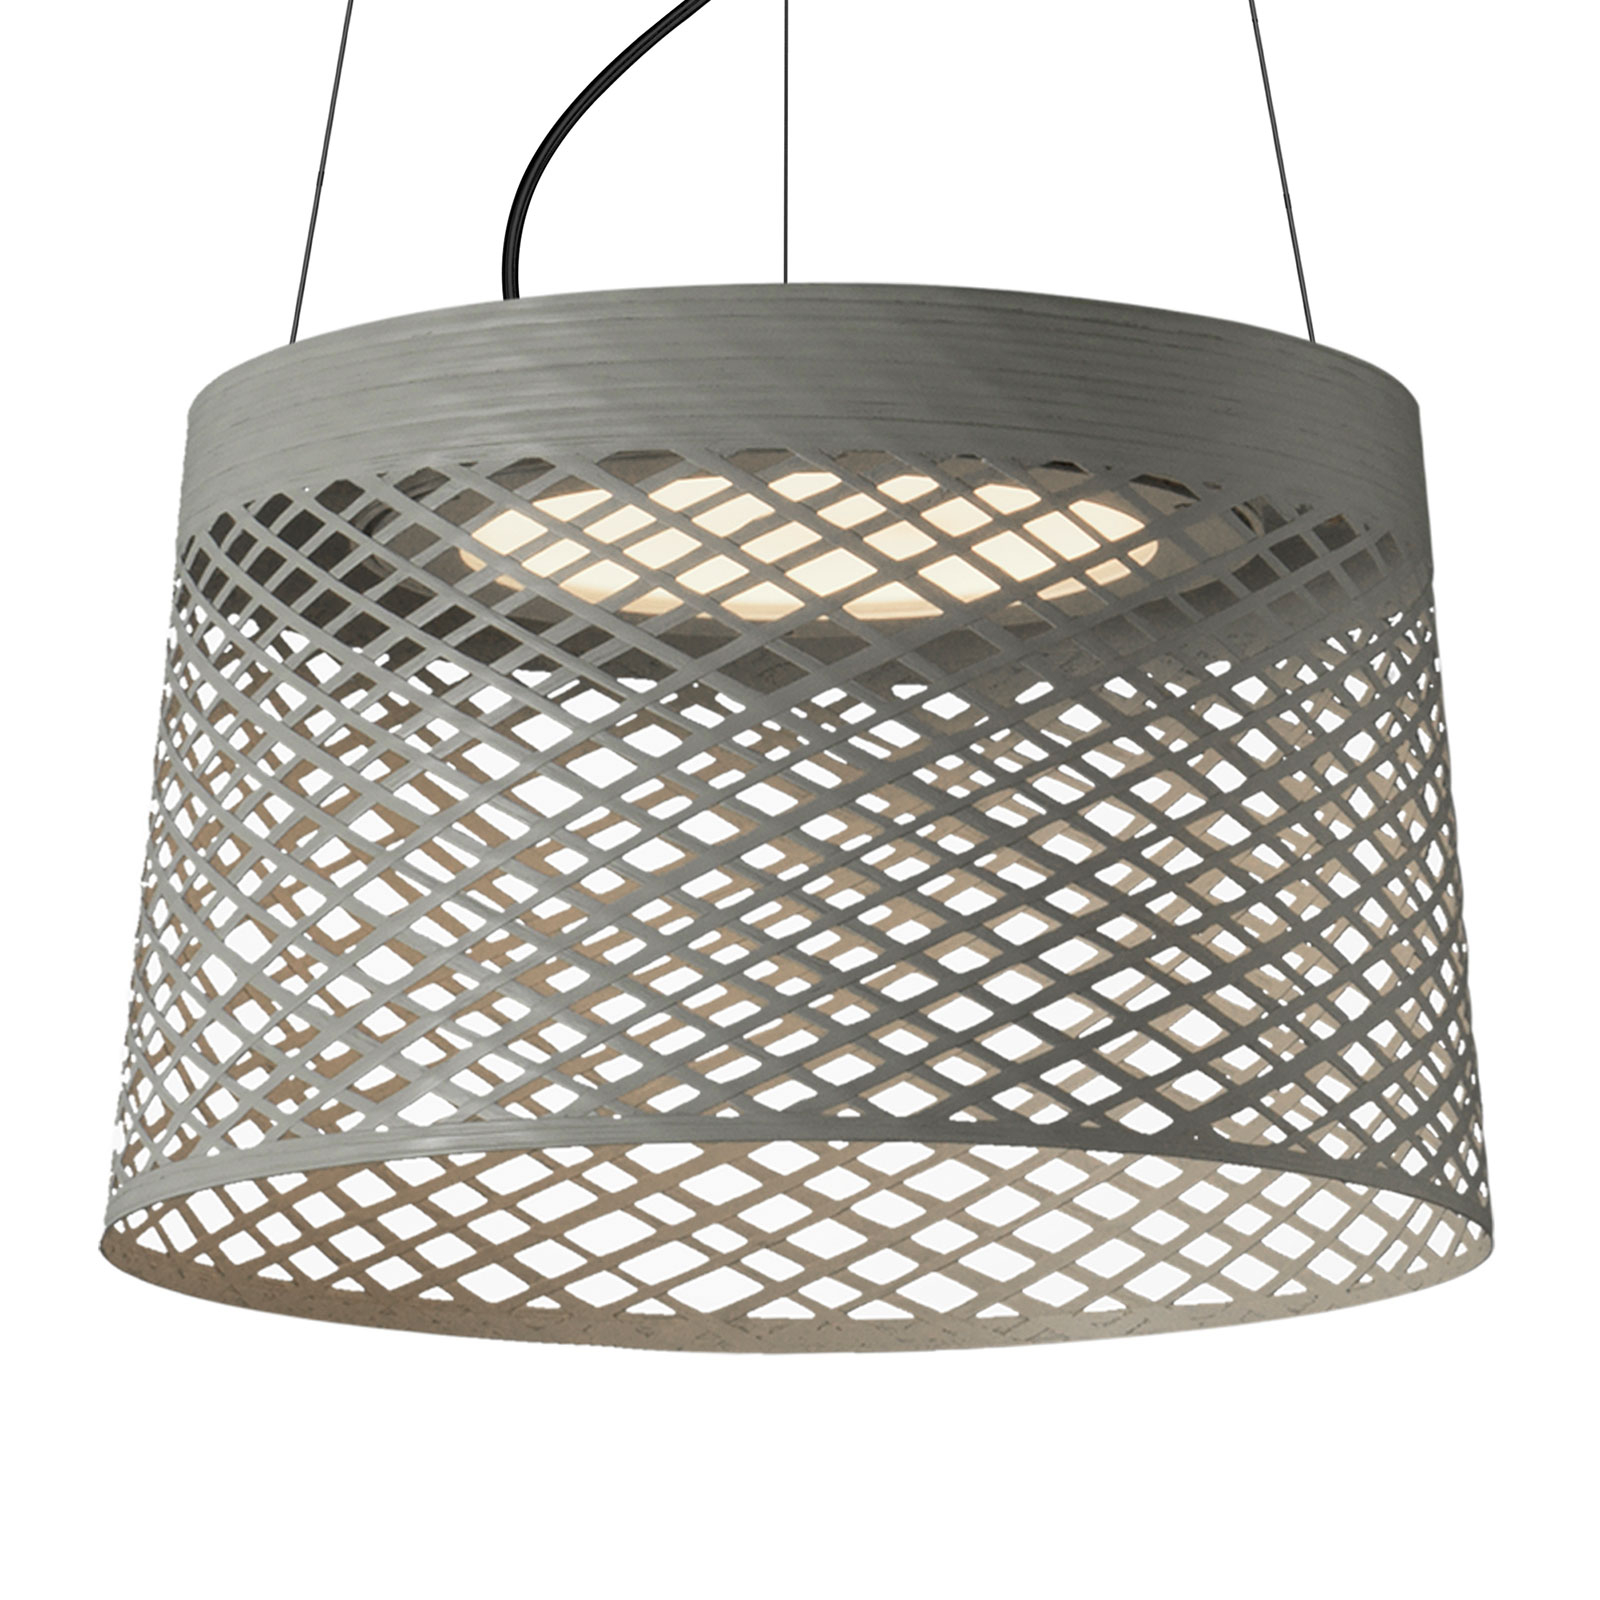 Foscarini Twiggy LED hengelampe greige